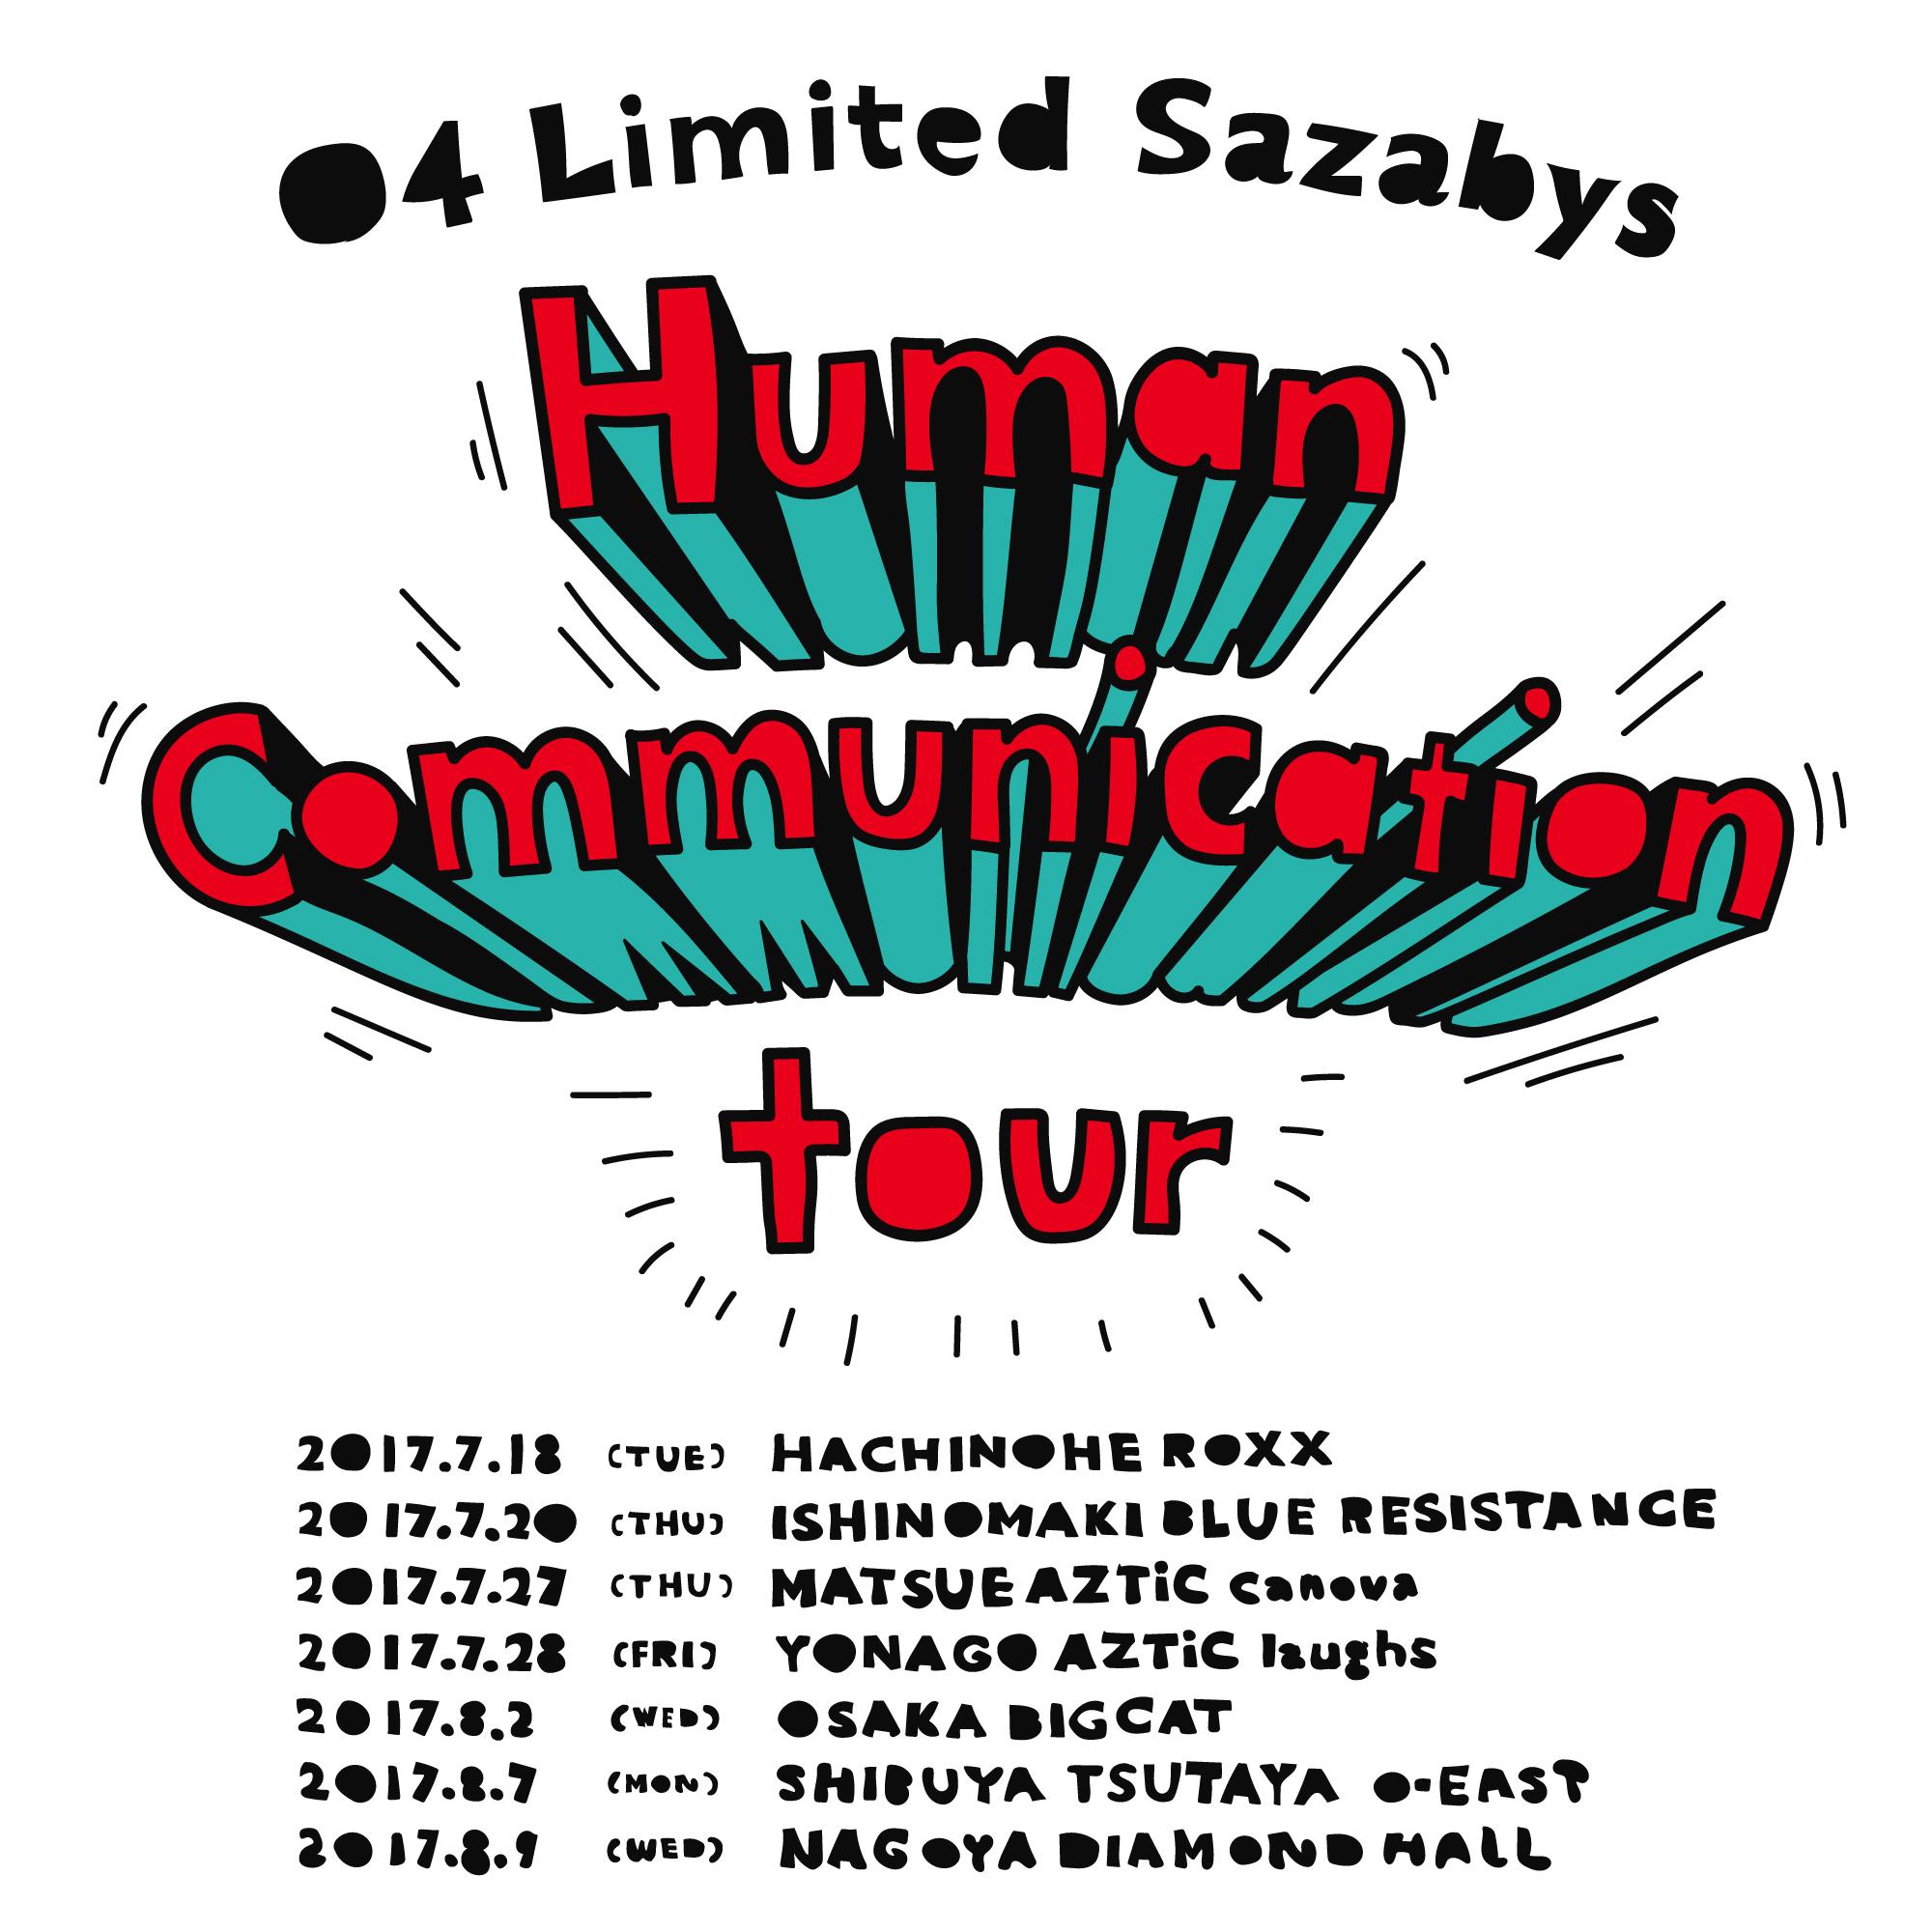 「Human Communication tour」告知画像